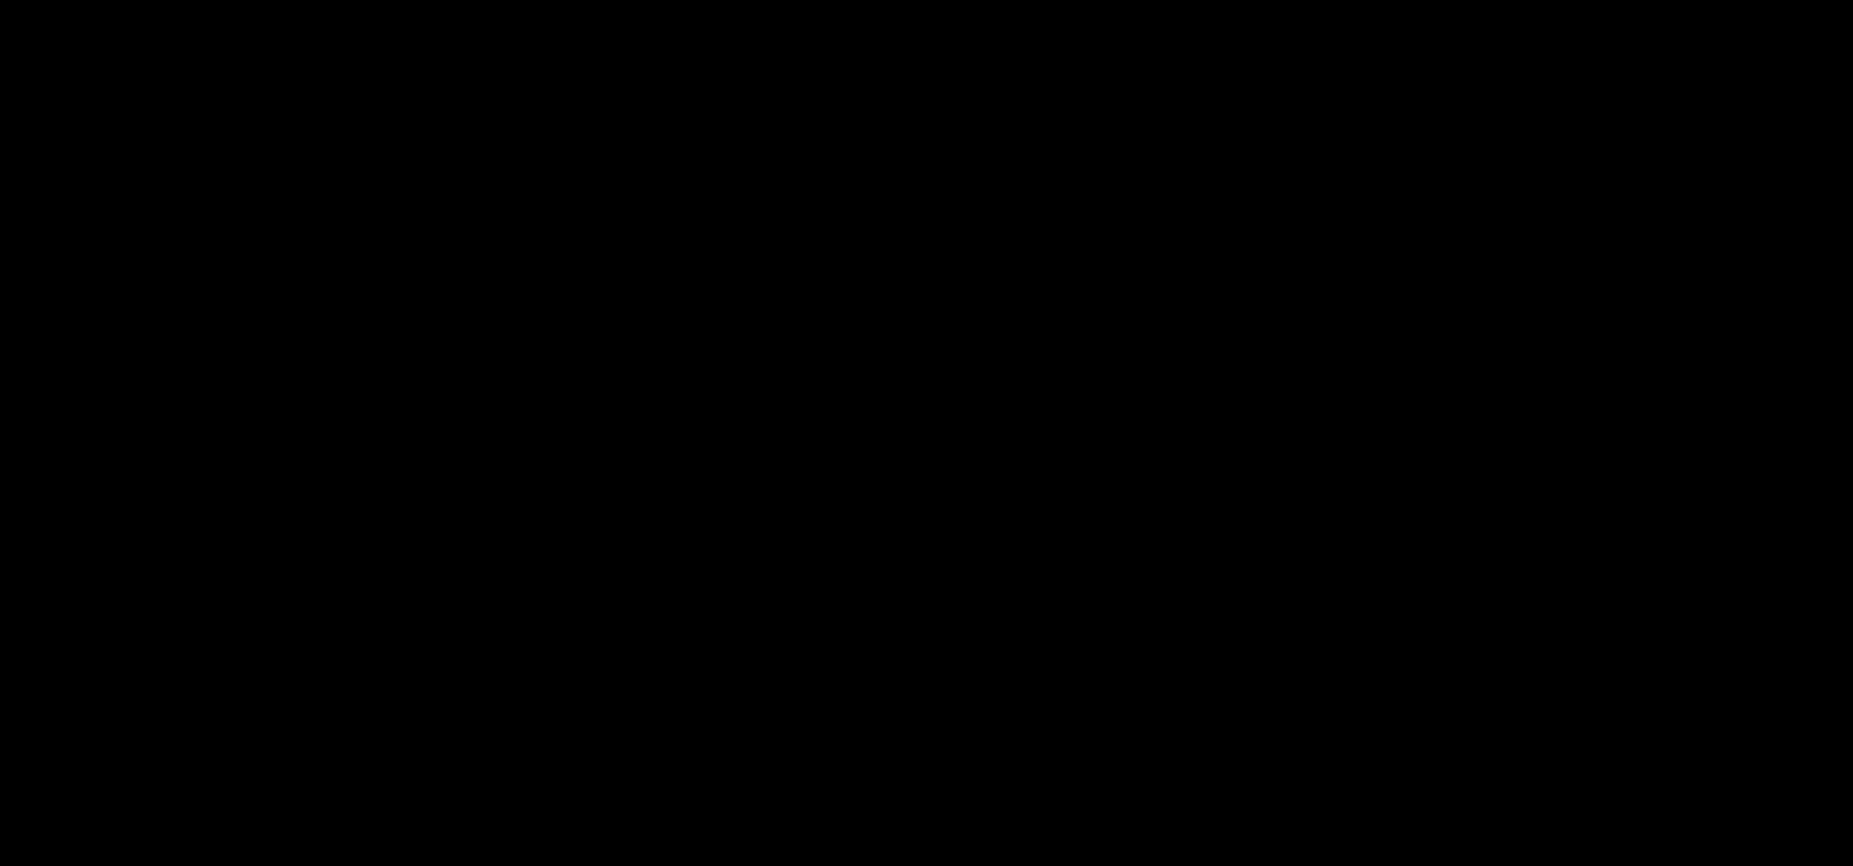 26,27-Didesmethyl-1,3-(tert-butyldimethylsilyl) (5E)-Calcitriol 24-Carboxylic Acid Methyl Ester